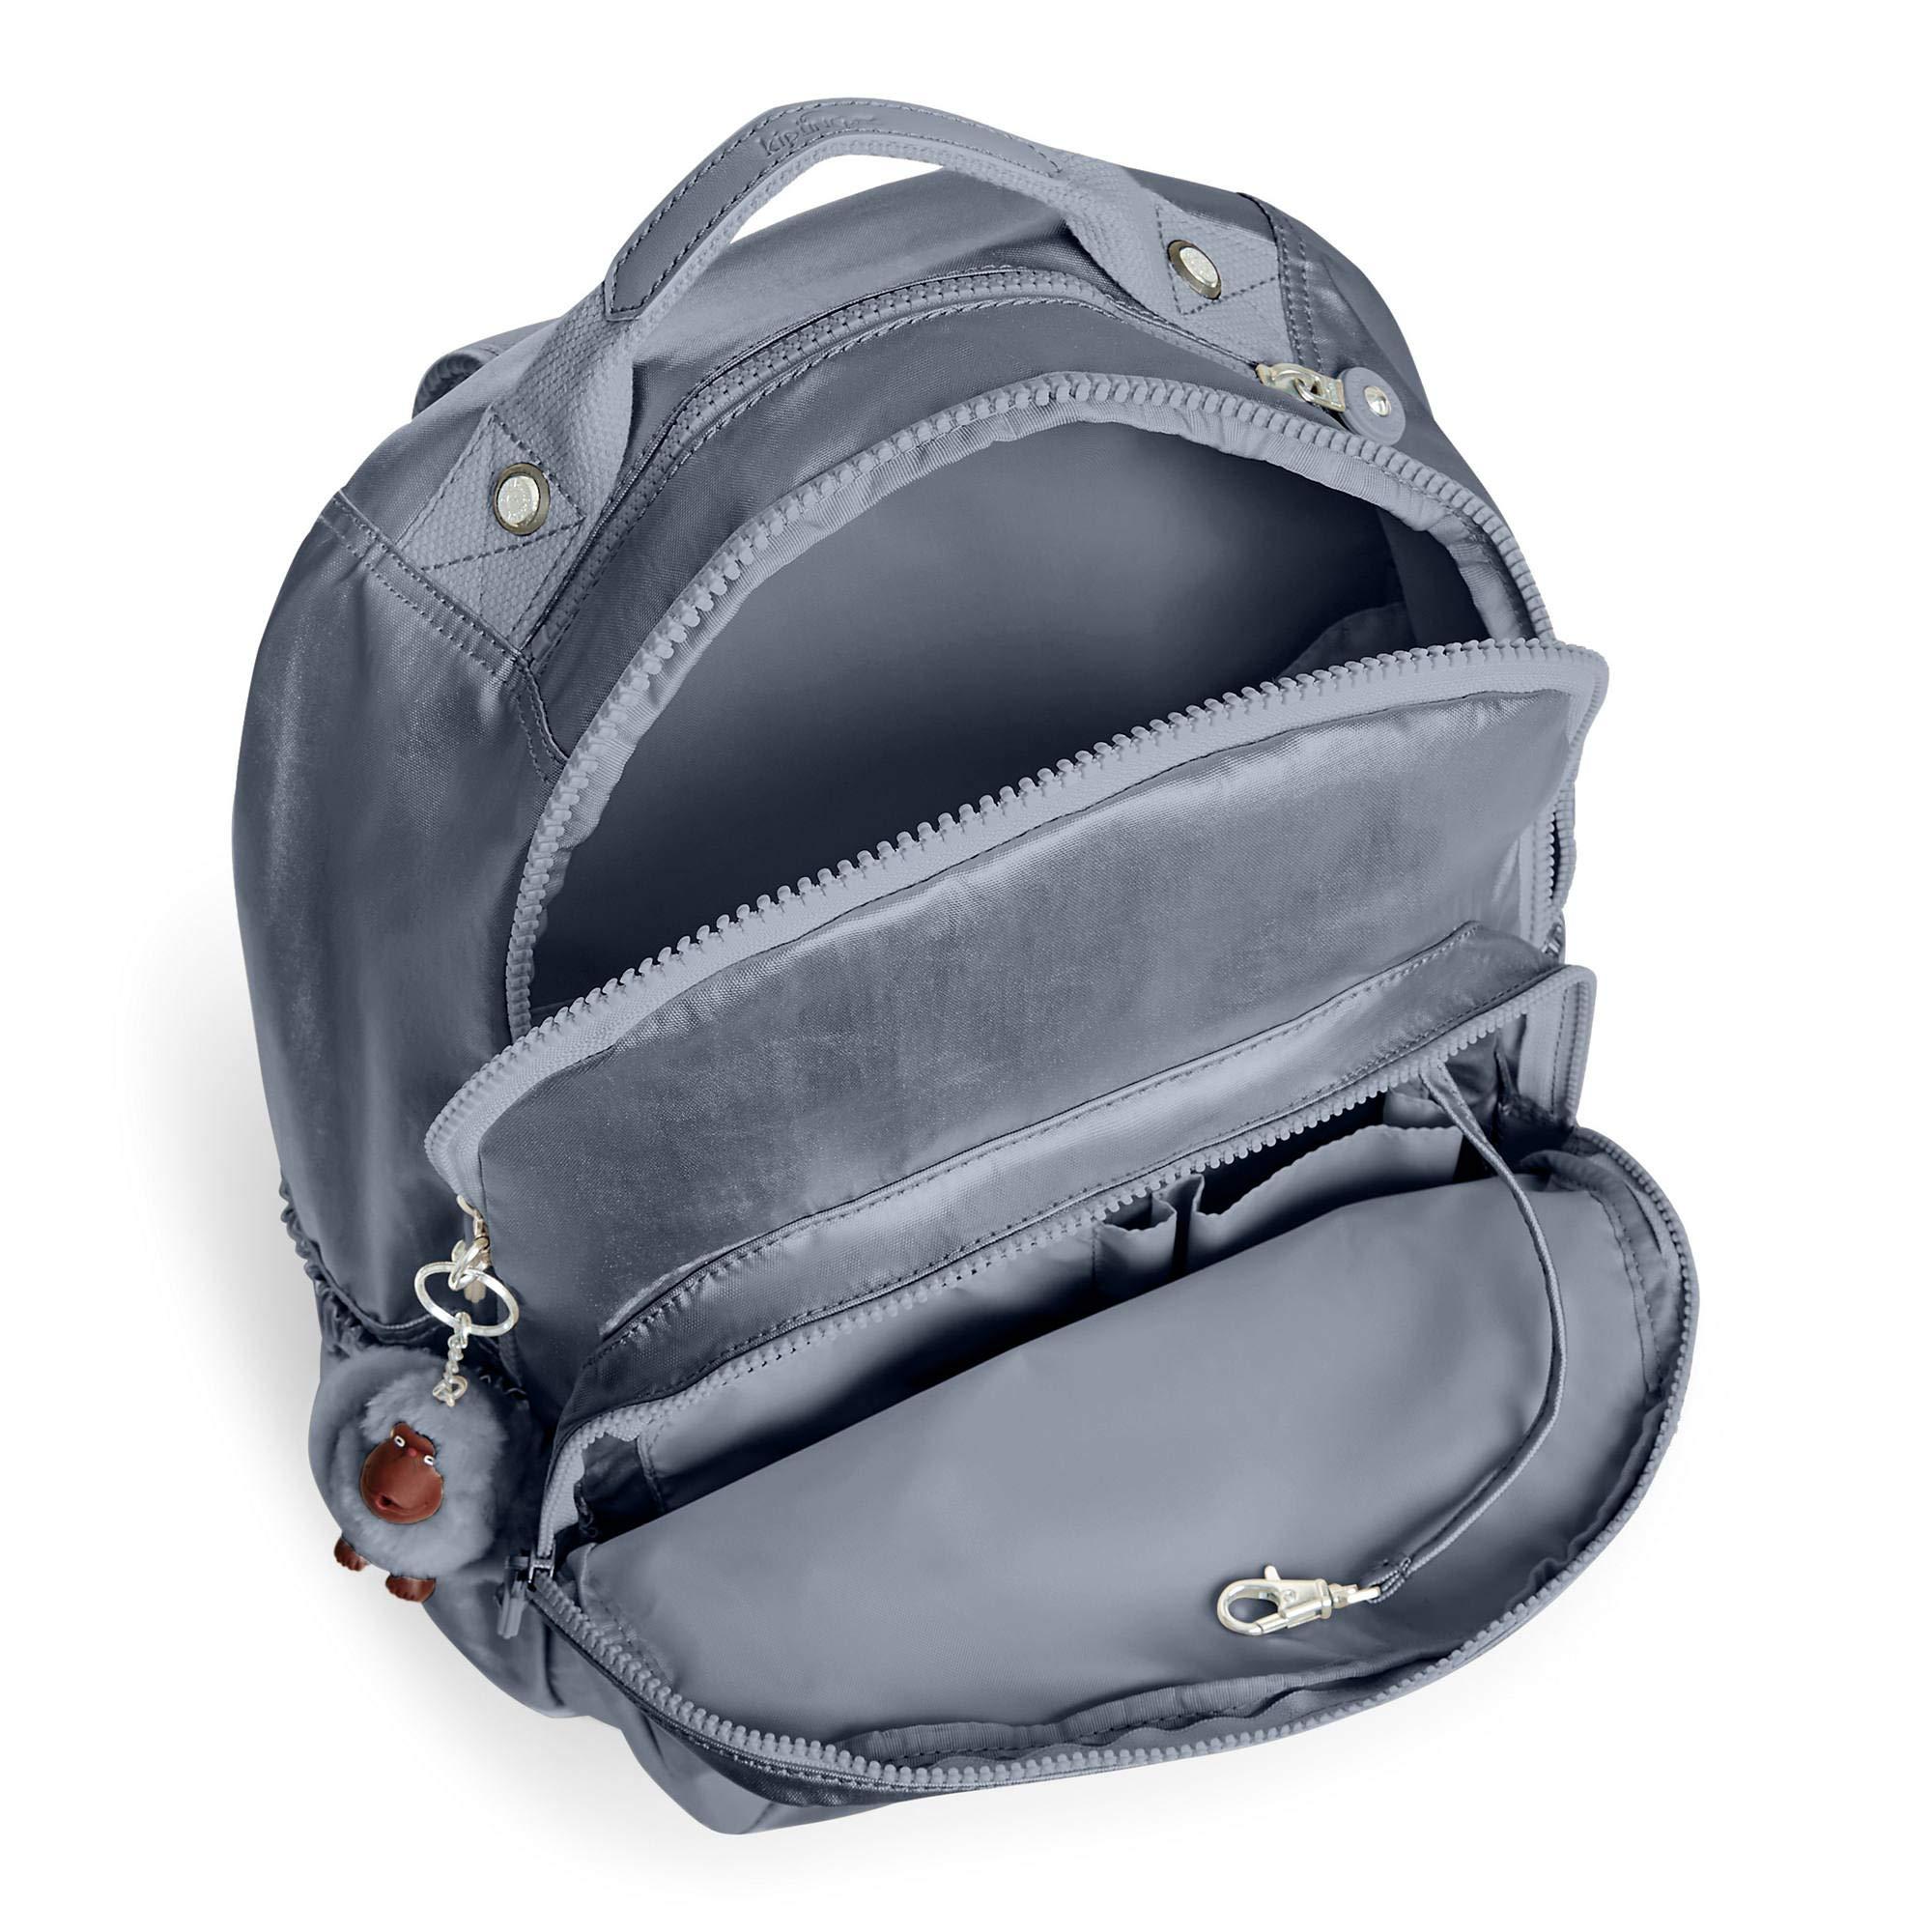 Kipling Seoul Go Large Metallic 15'' Laptop Backpack One Size Steel Grey Metallic by Kipling (Image #3)